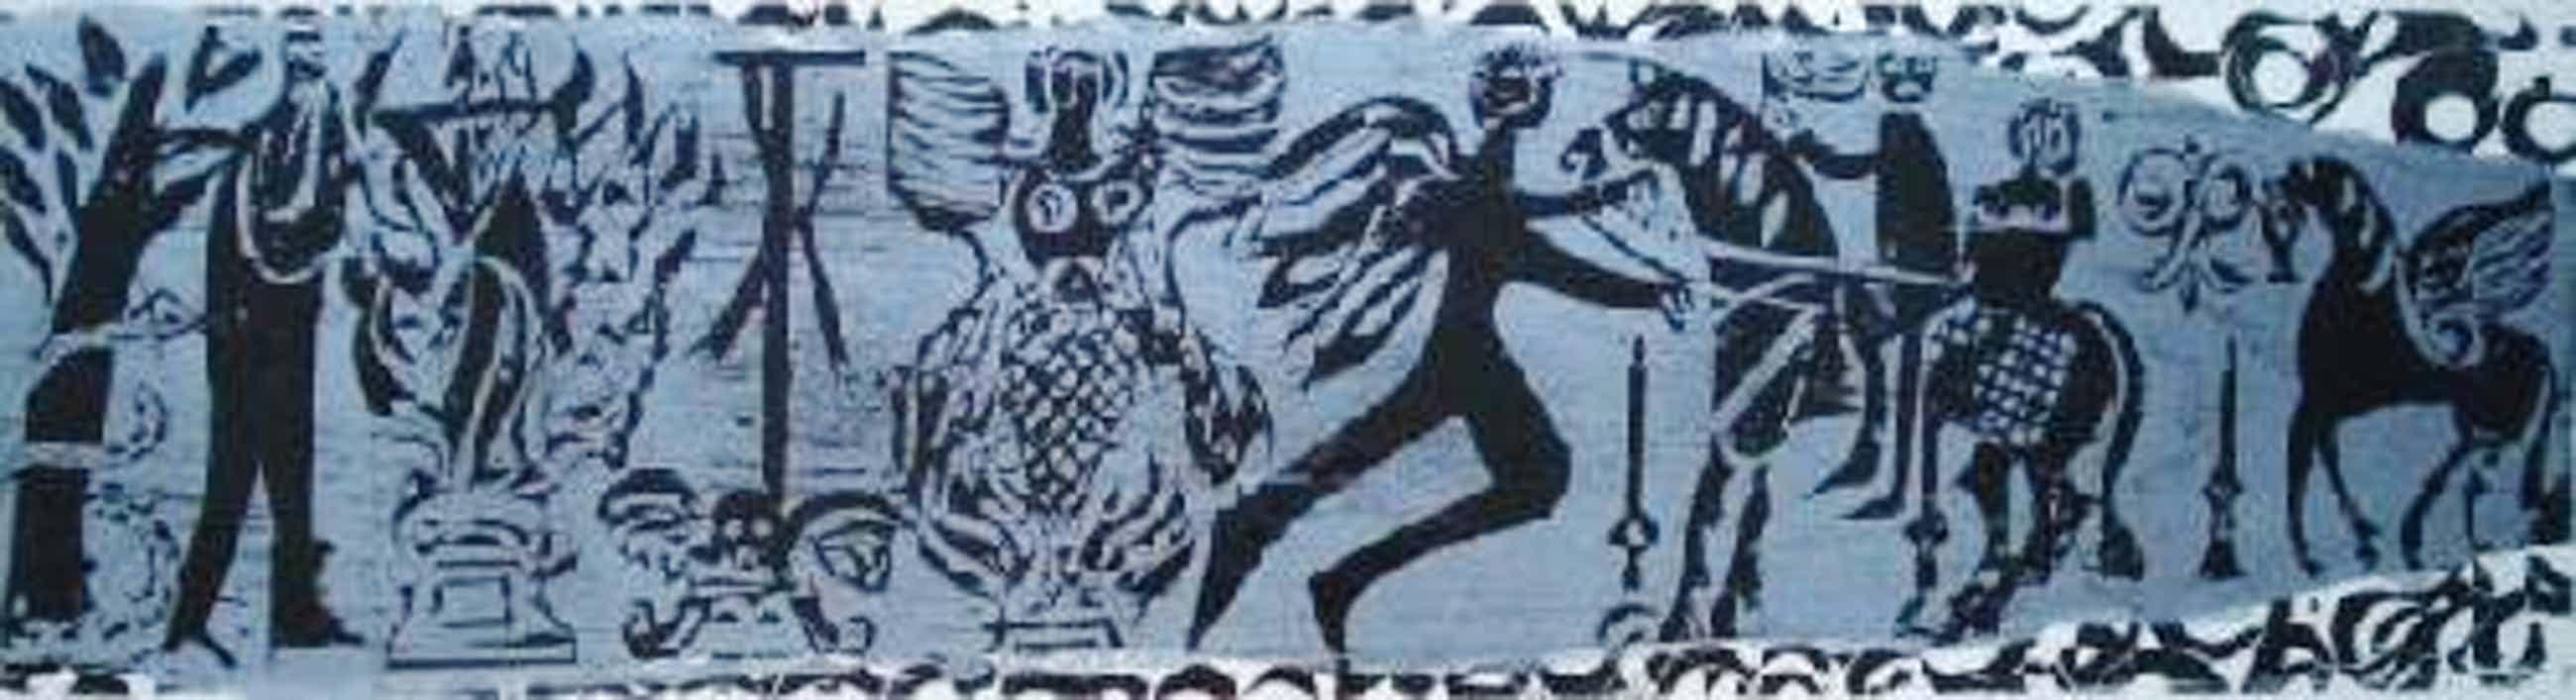 H.A.P. Grieshaber - zweifarbiger Holzschnitt silber/schwarz 77 x 22 cm, 1966 kopen? Bied vanaf 35!